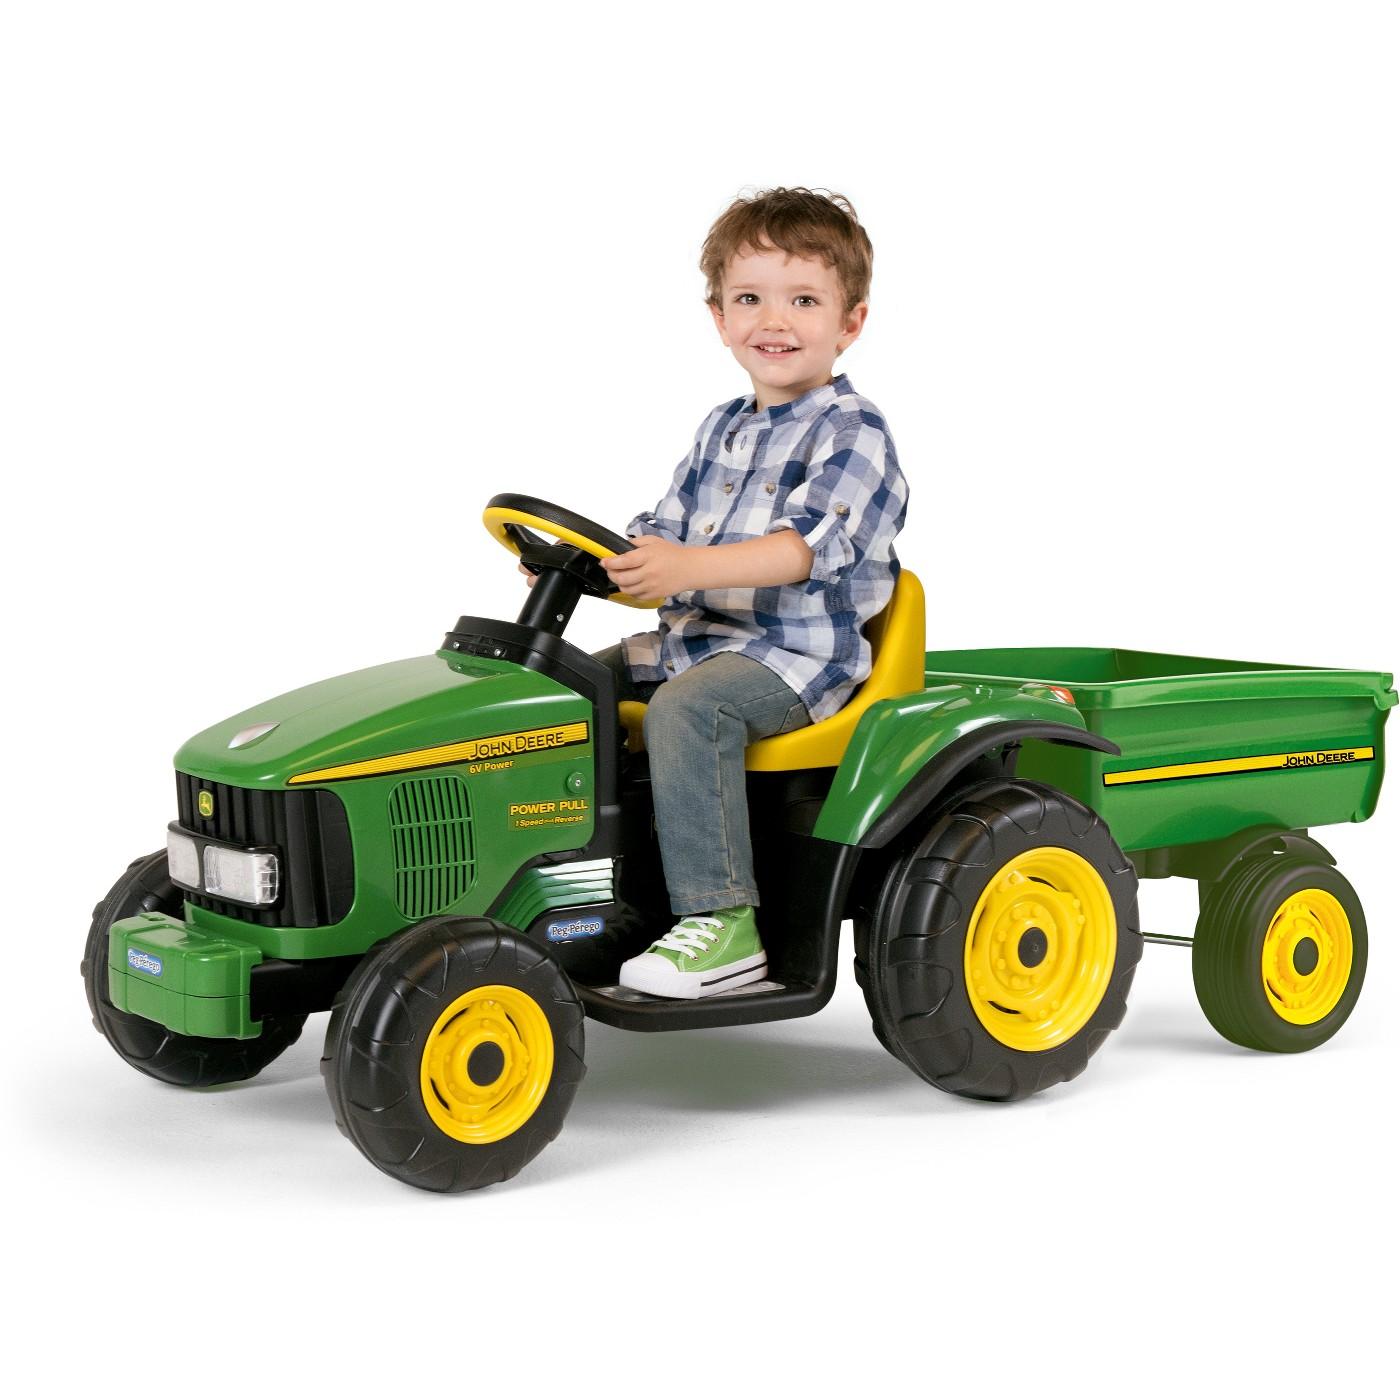 Peg Perego John Deere 6V Power Pull Tractor - Green - image 1 of 6